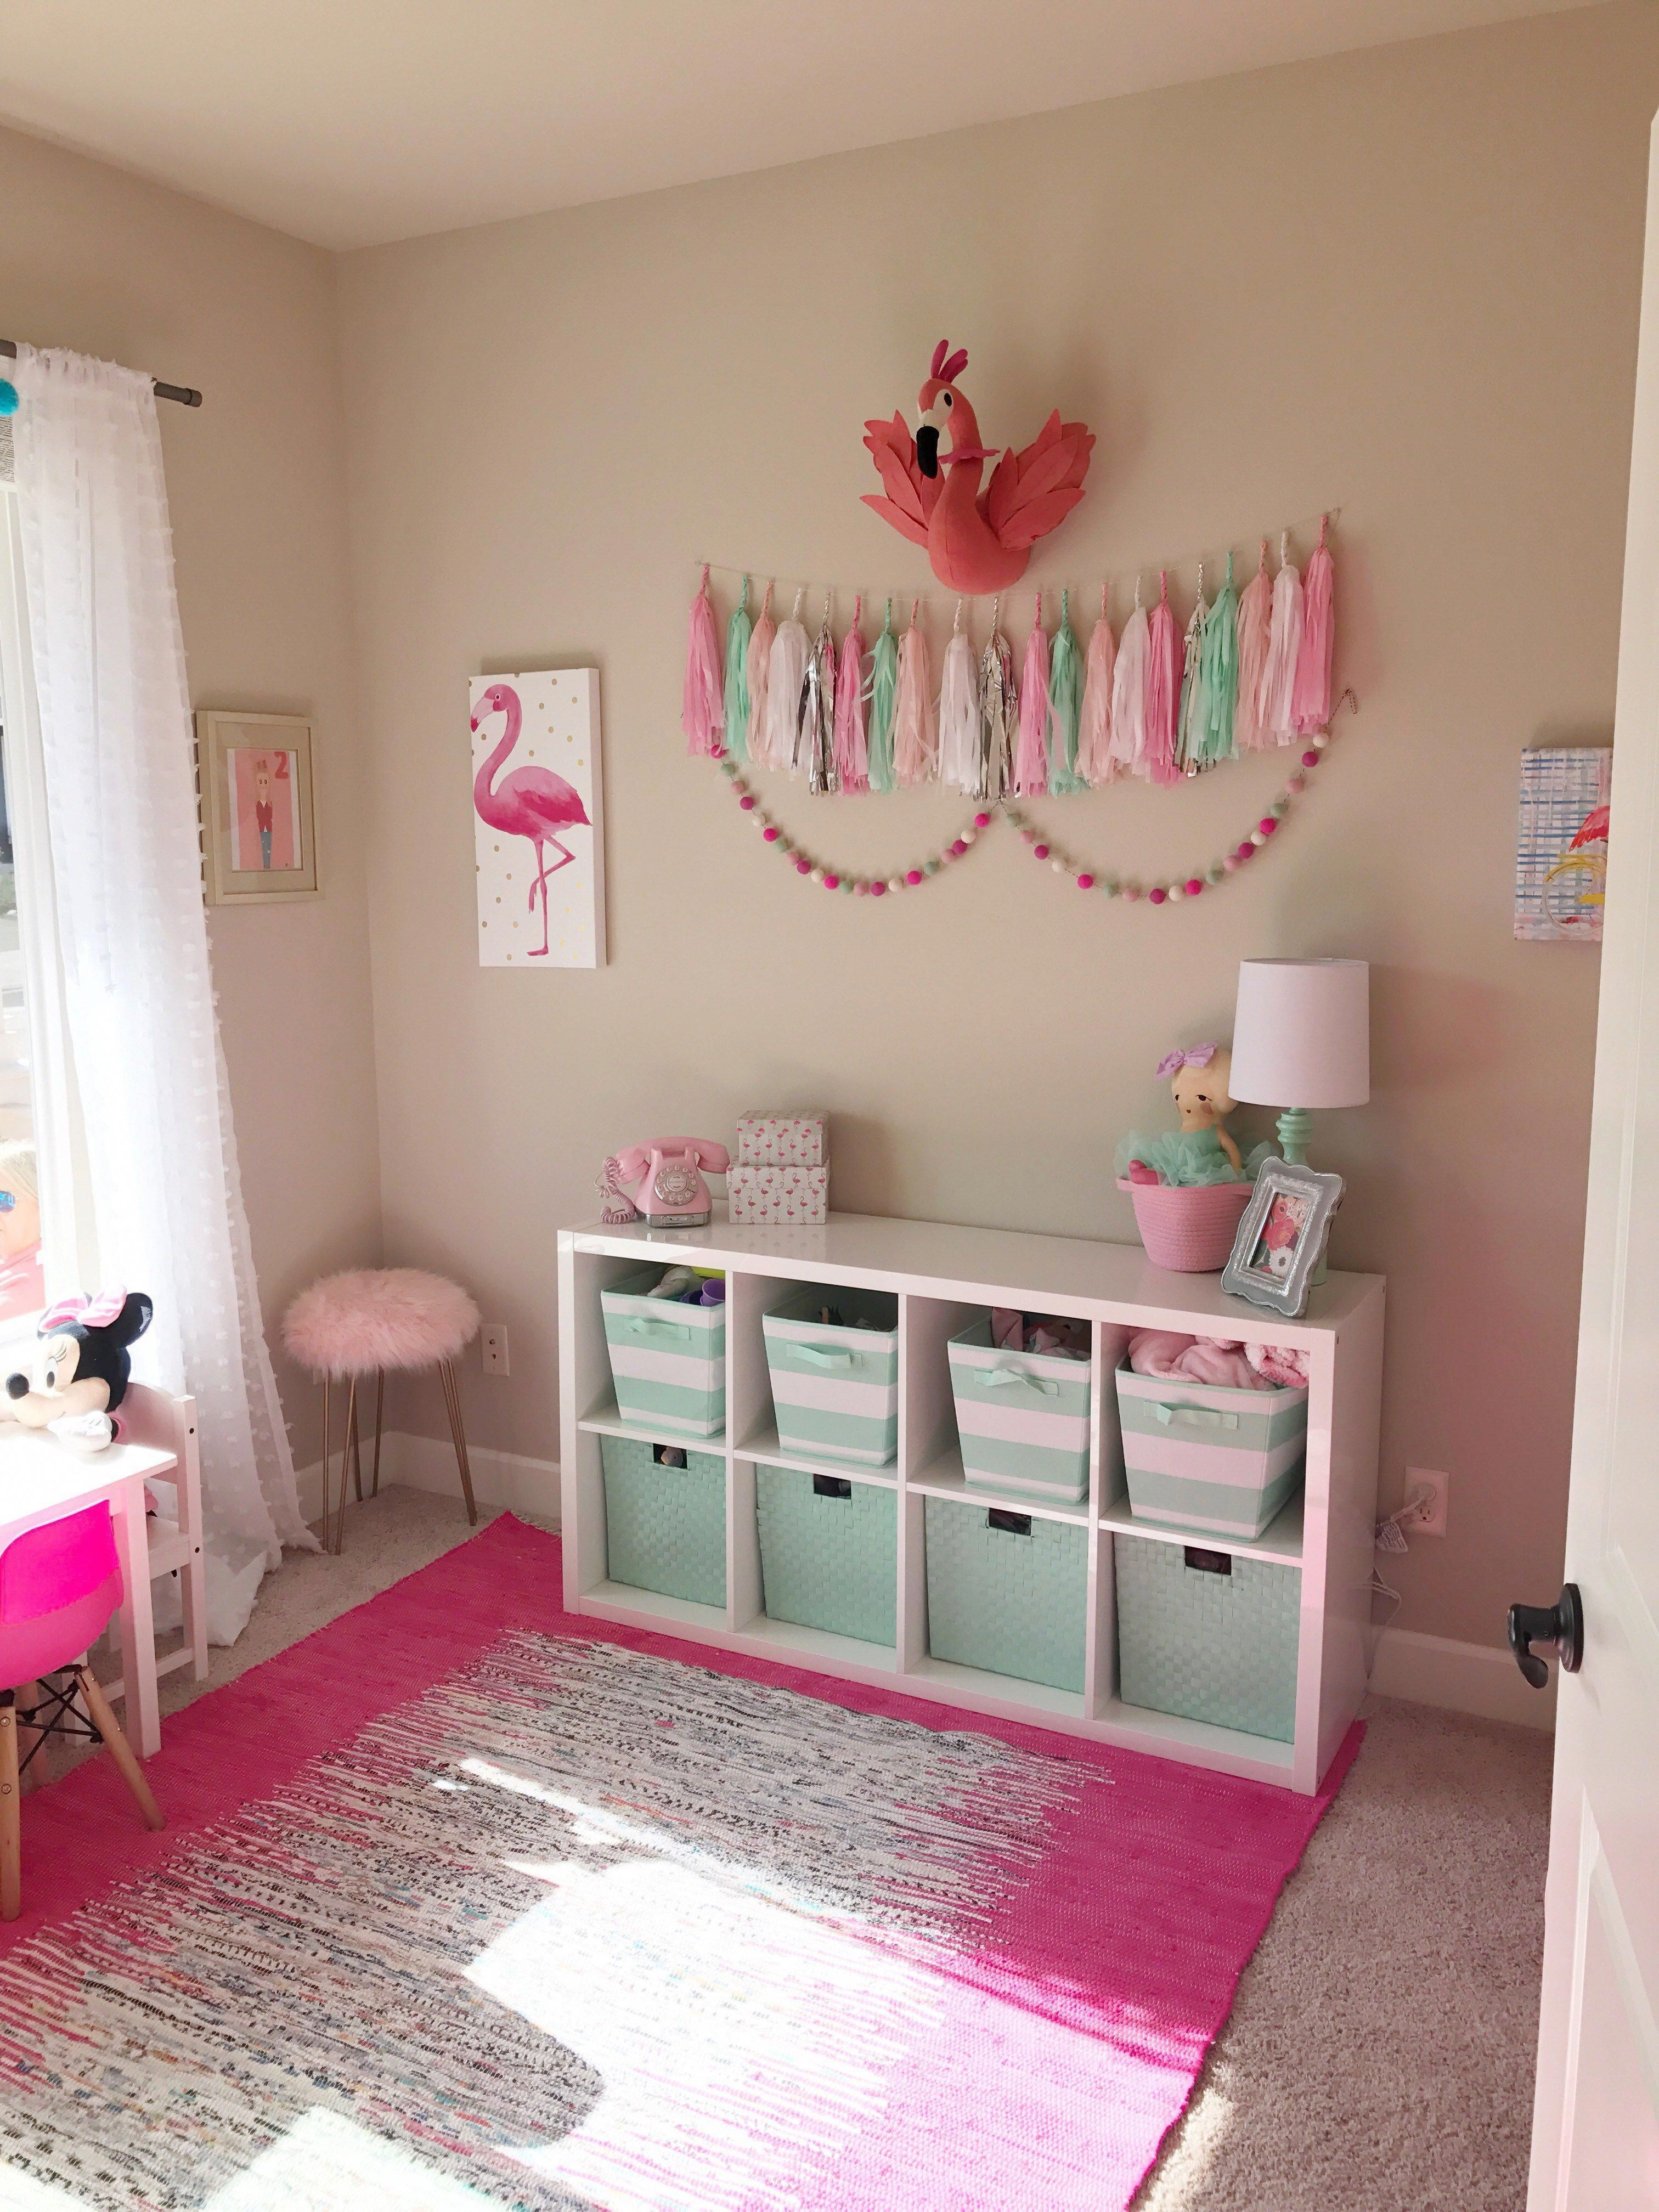 Girly Playroom Toddler Play Room Decoracioncuartoadolecentes